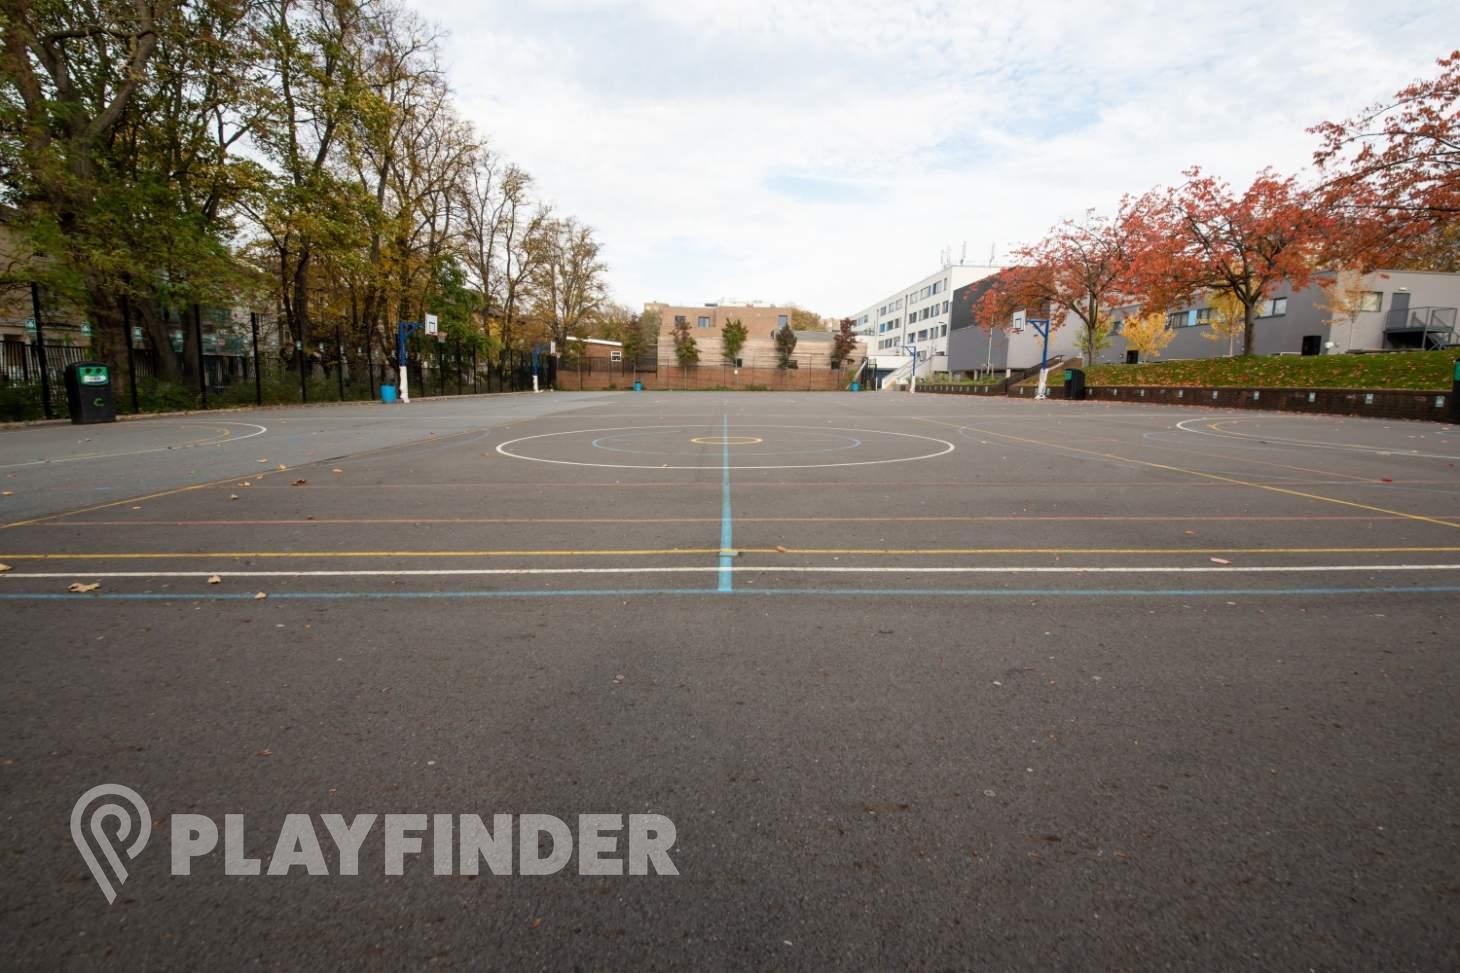 Harris Academy St Johns Wood Court | Concrete basketball court